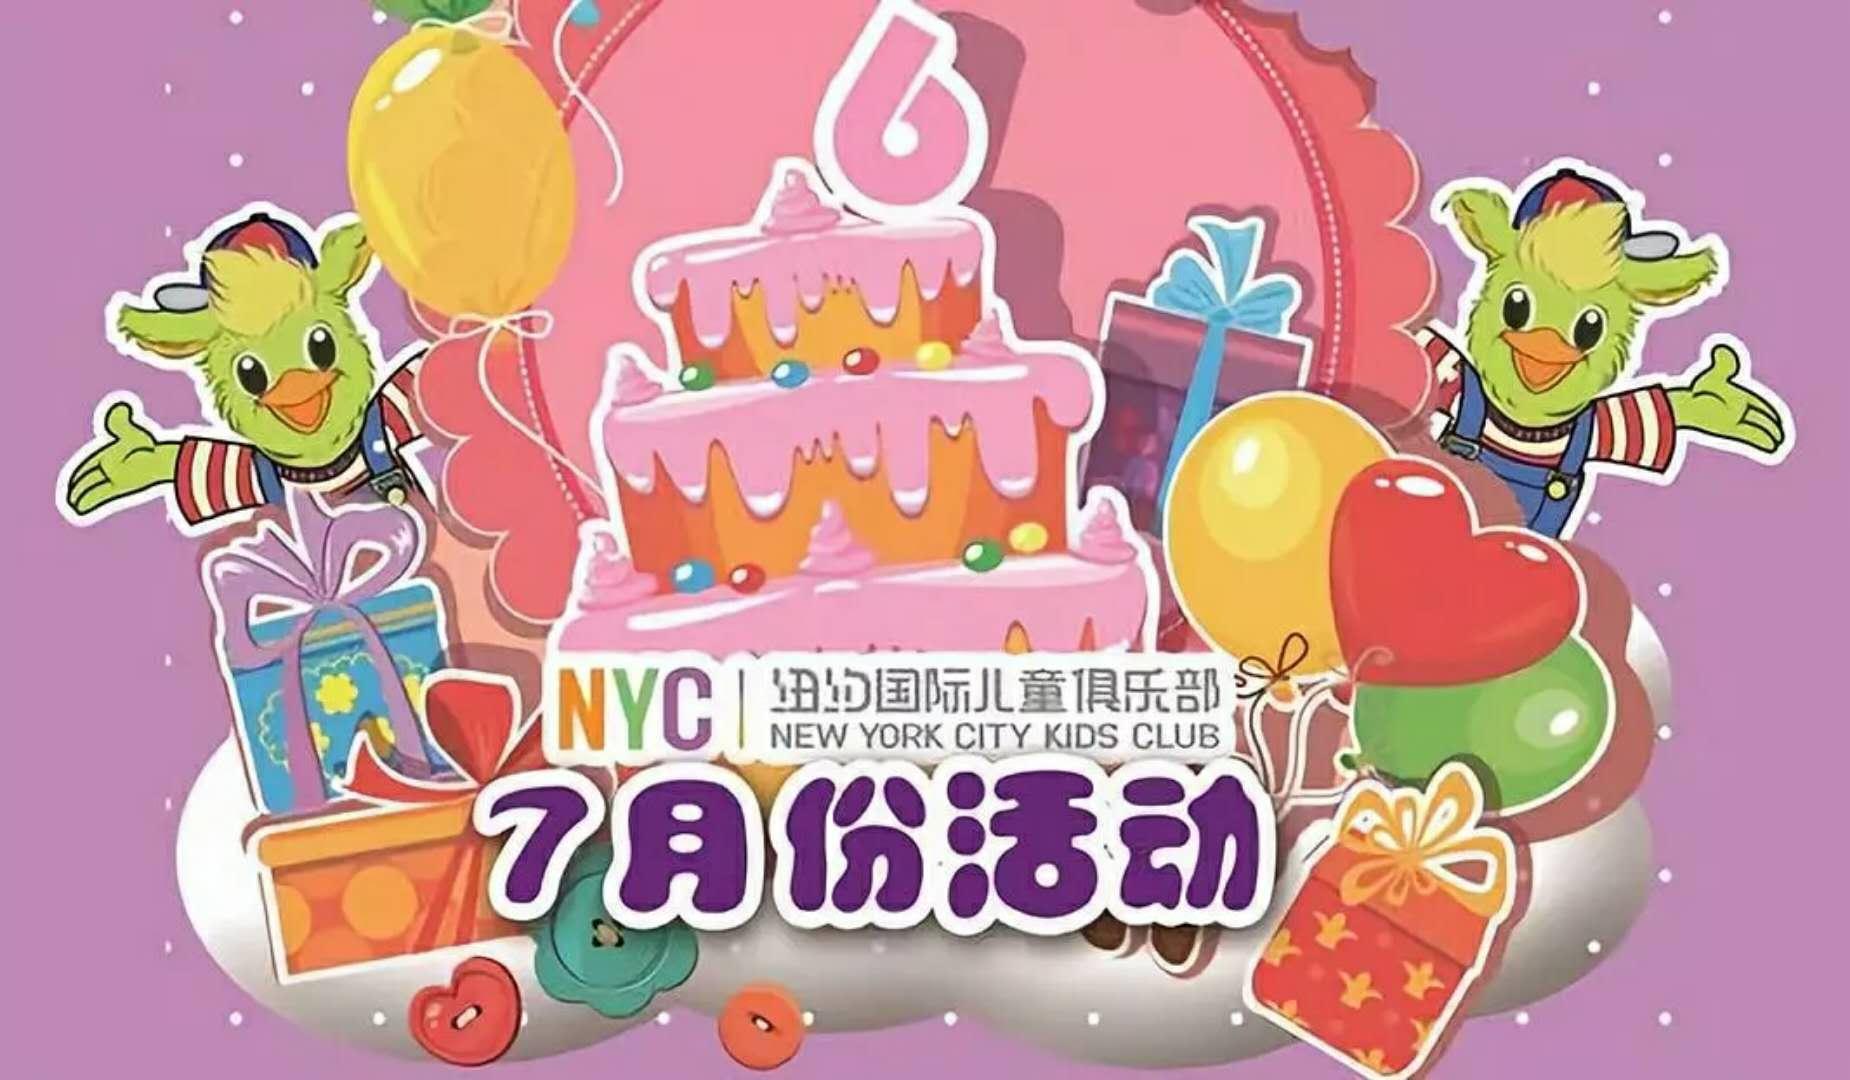 NYC西安莲湖早教中心:主题生日会活动预告